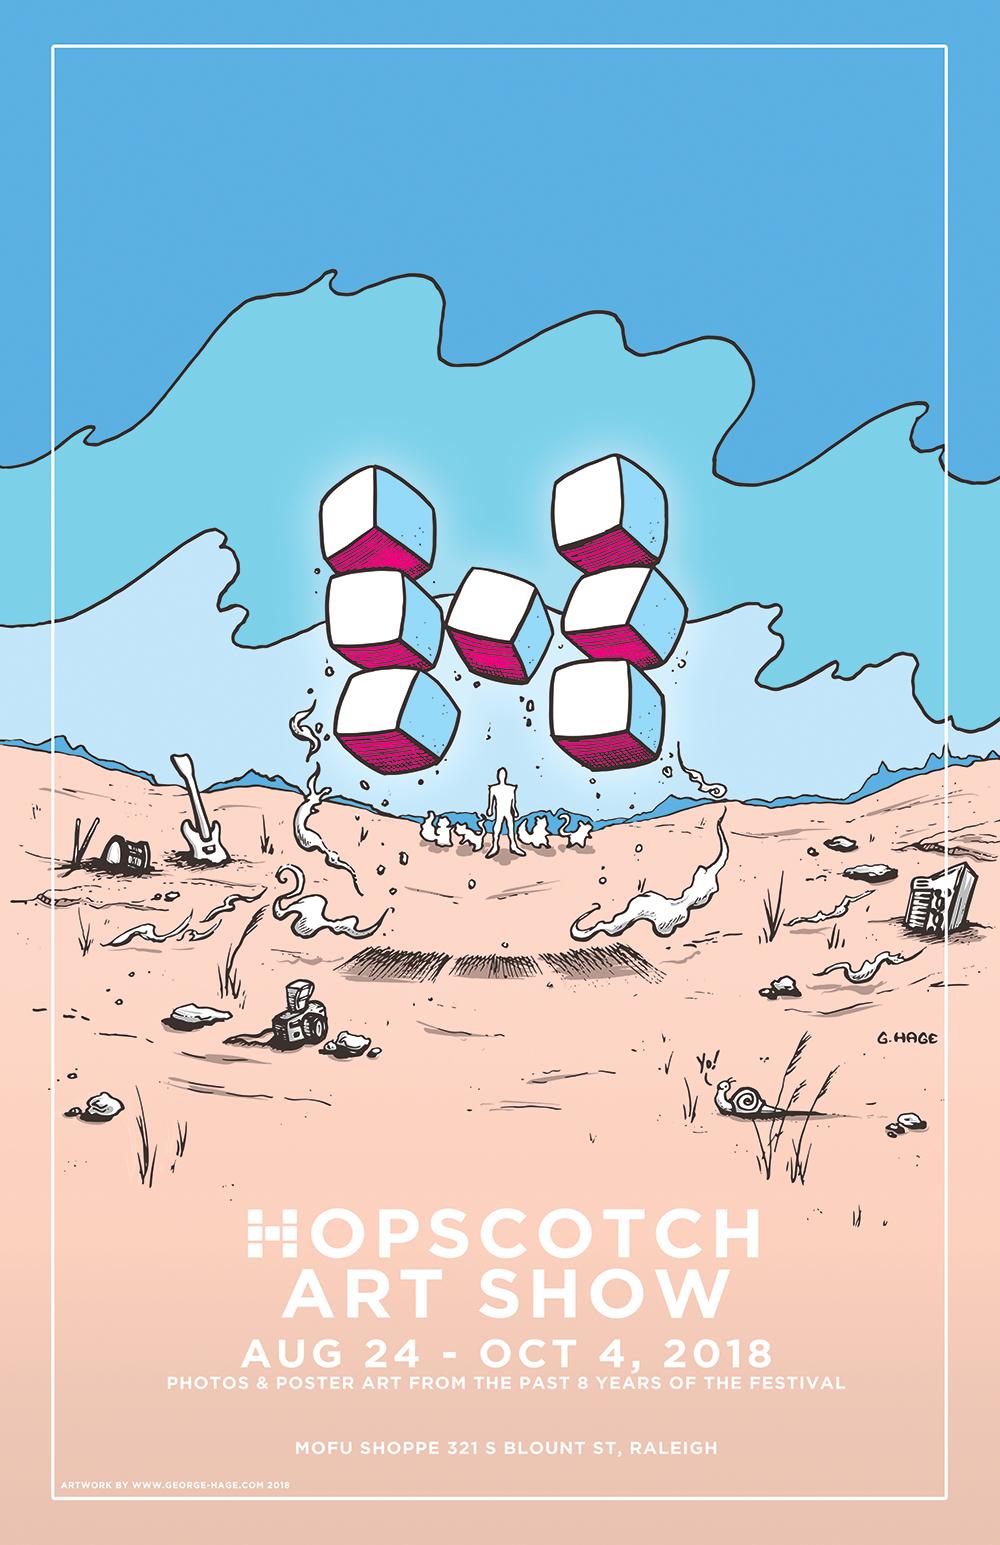 Hopscotch_ArtShow_2018_Poster_WEB1.jpg